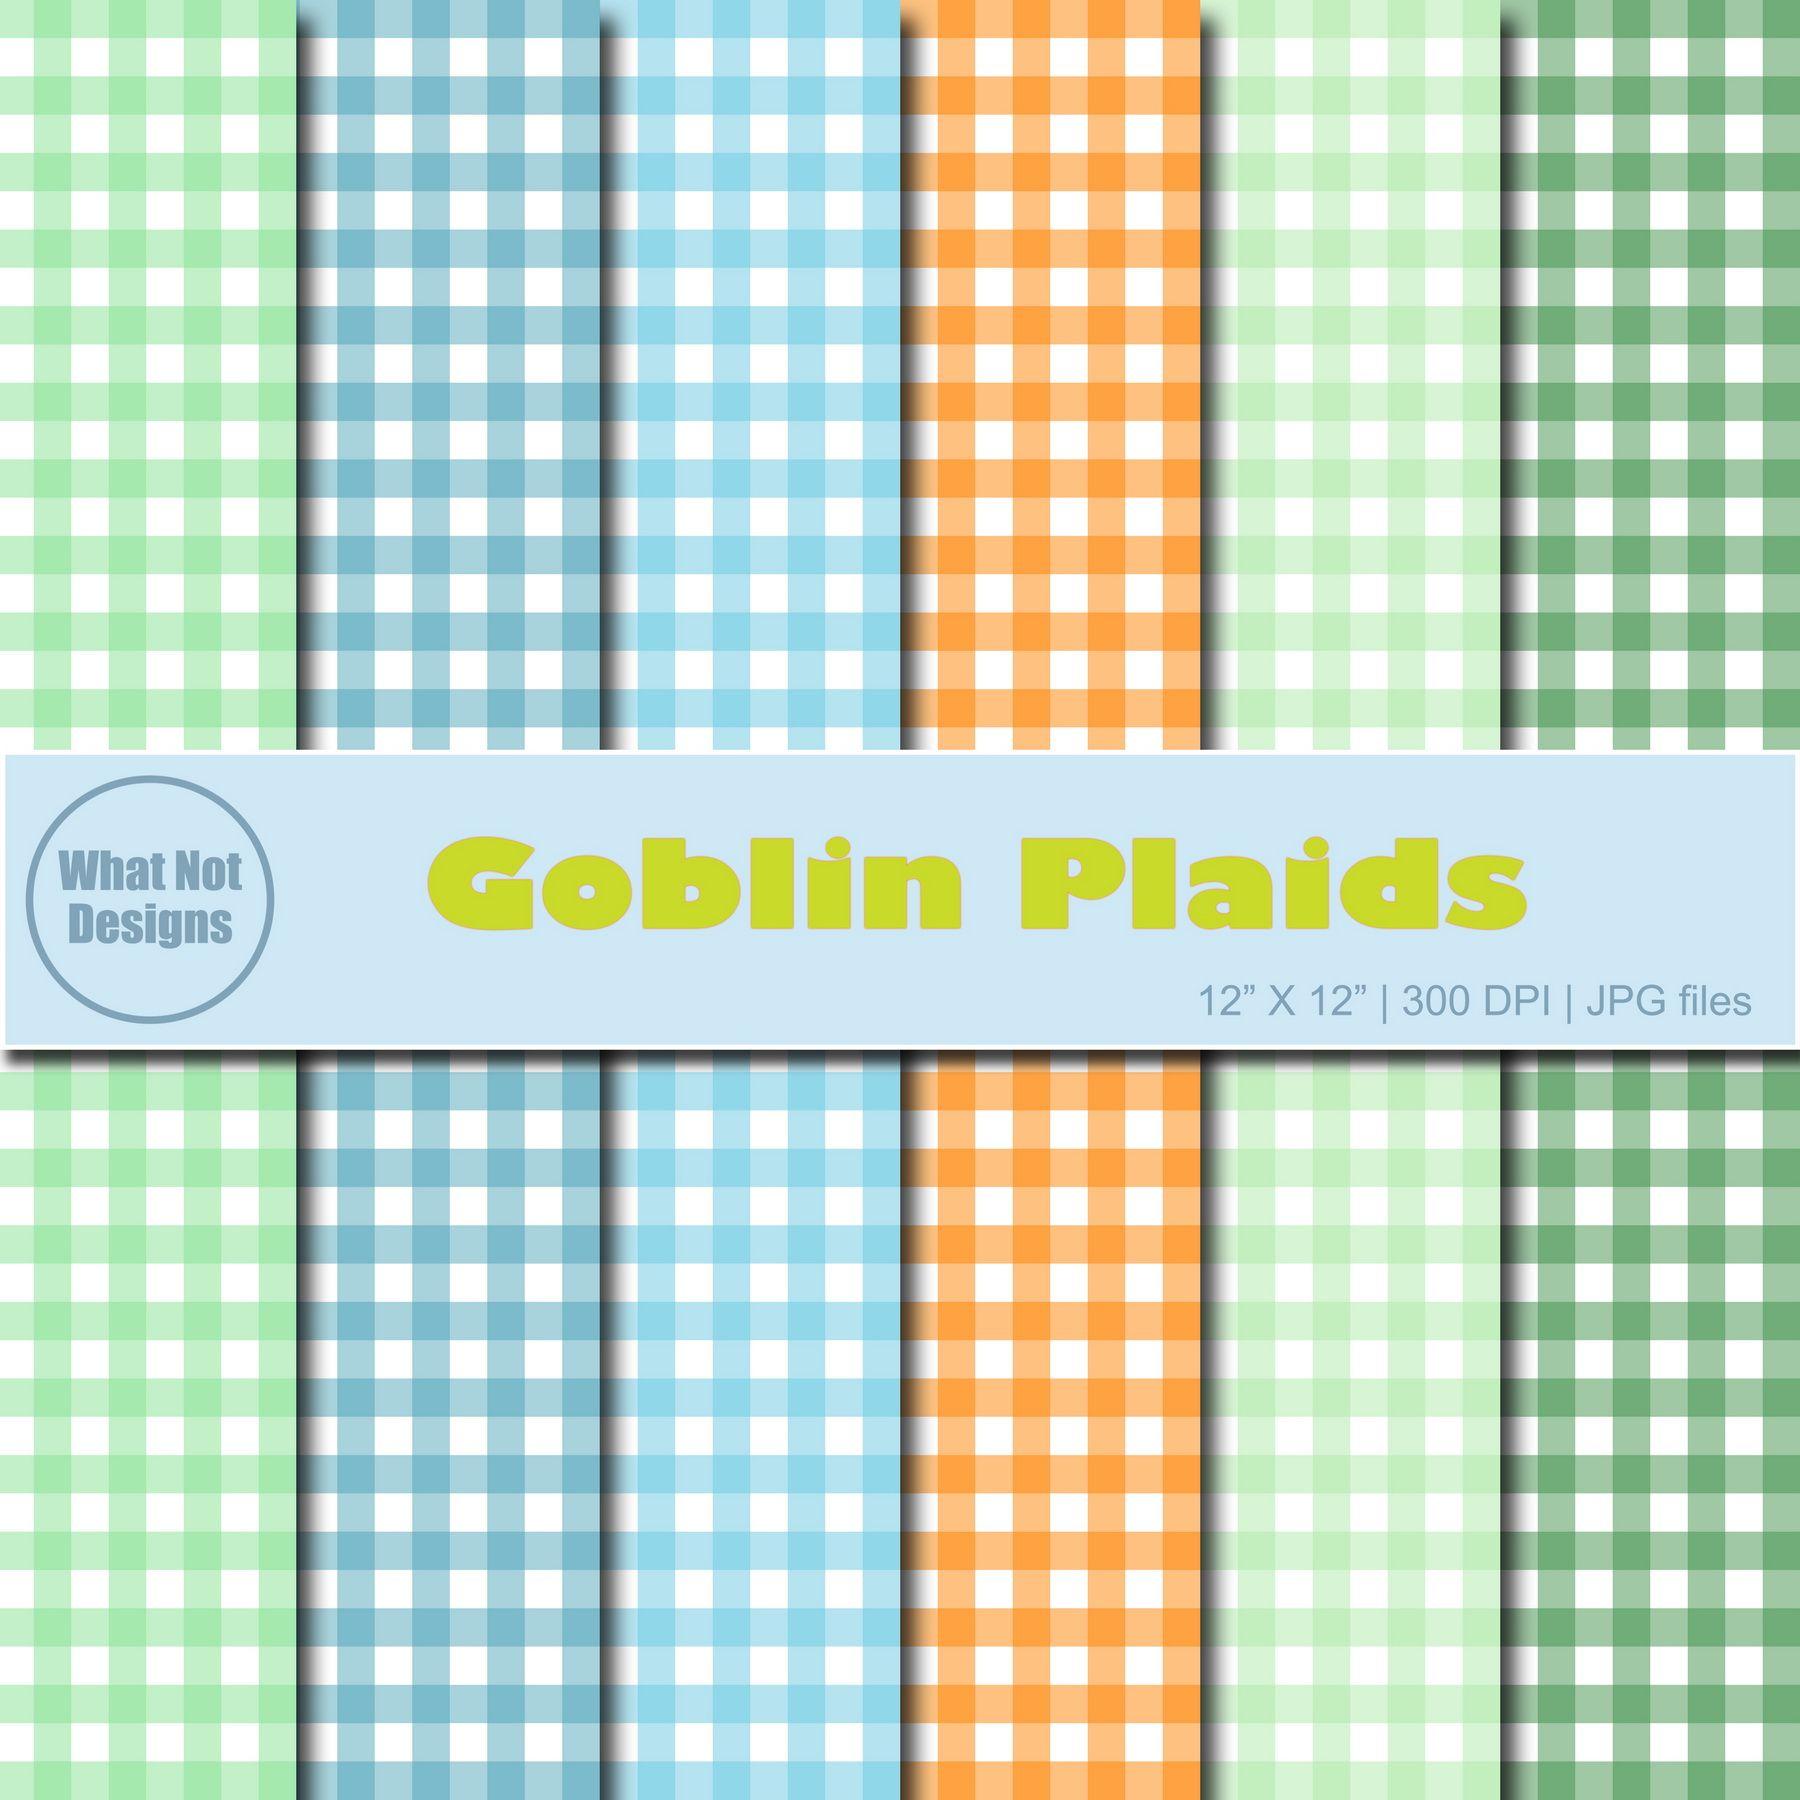 Goblin Plaids